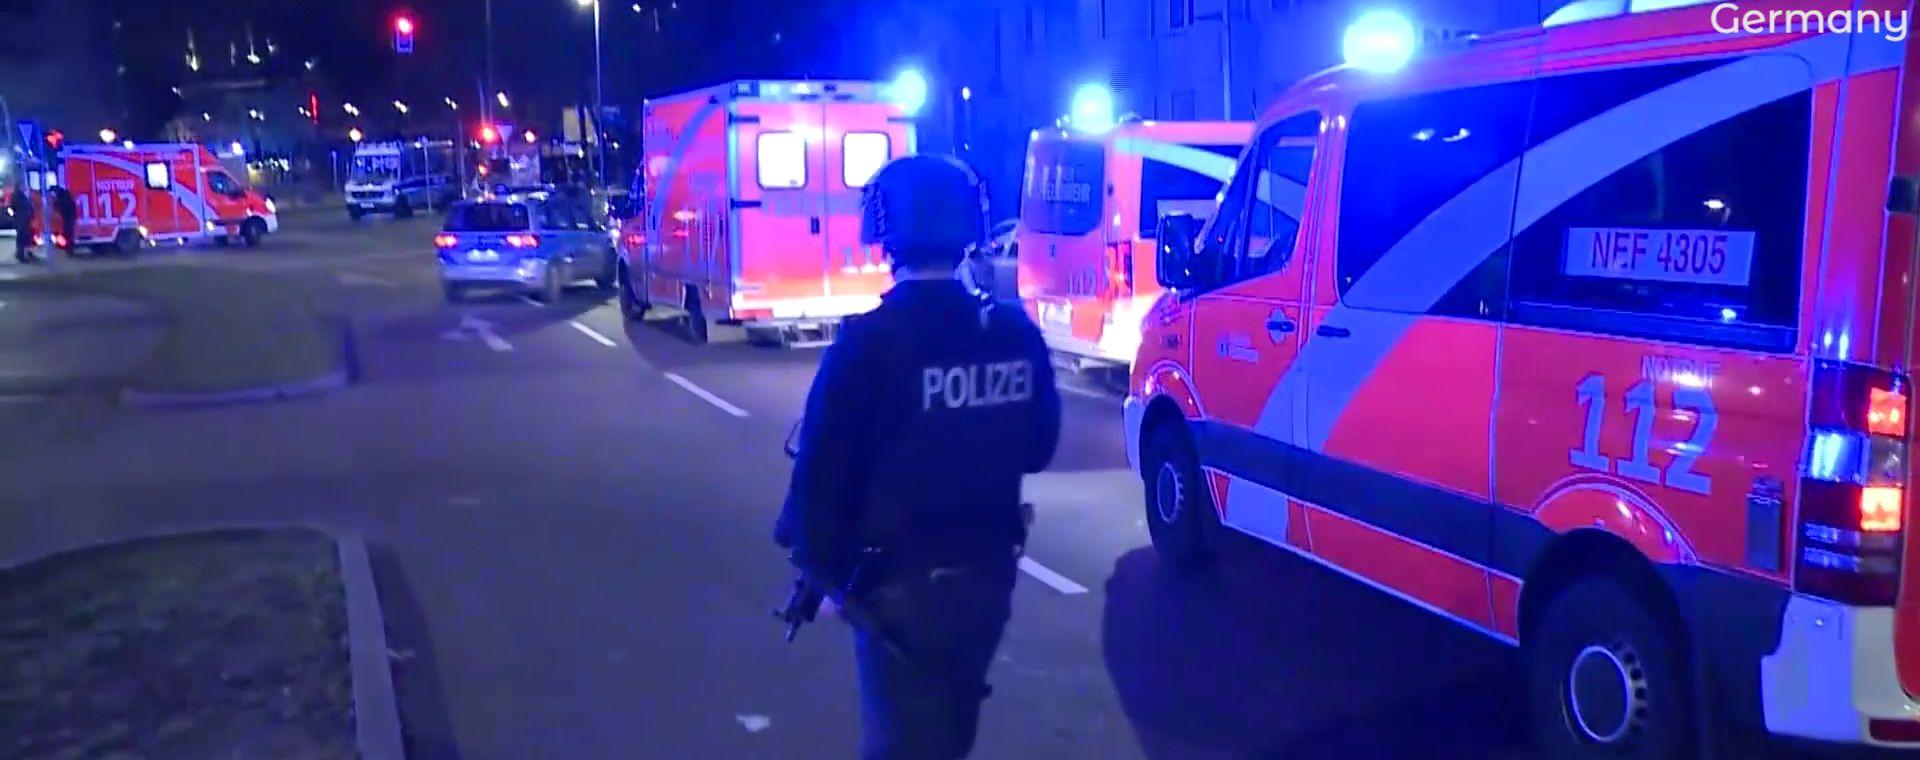 Berlin shooting